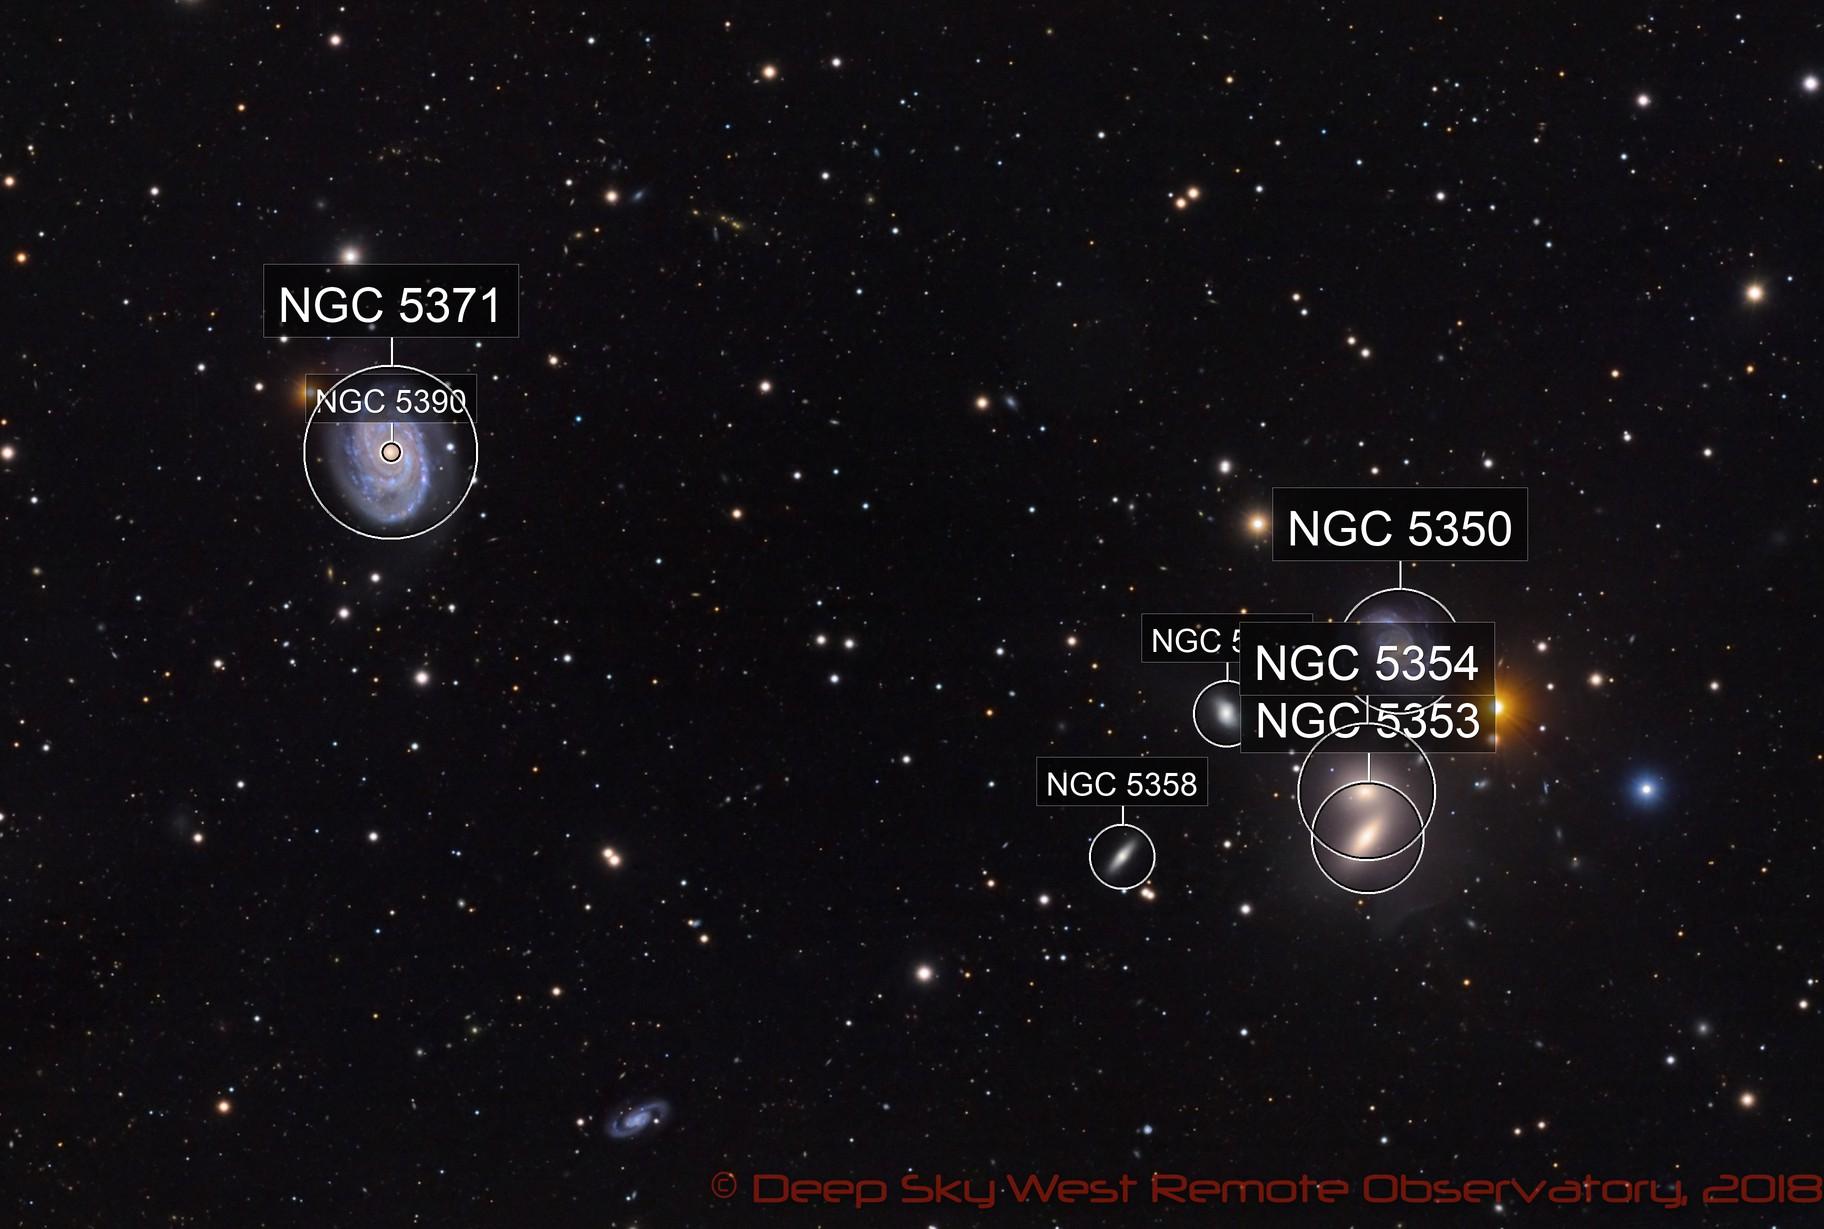 NGC 5371 - Deep Sky West Remote Observatory